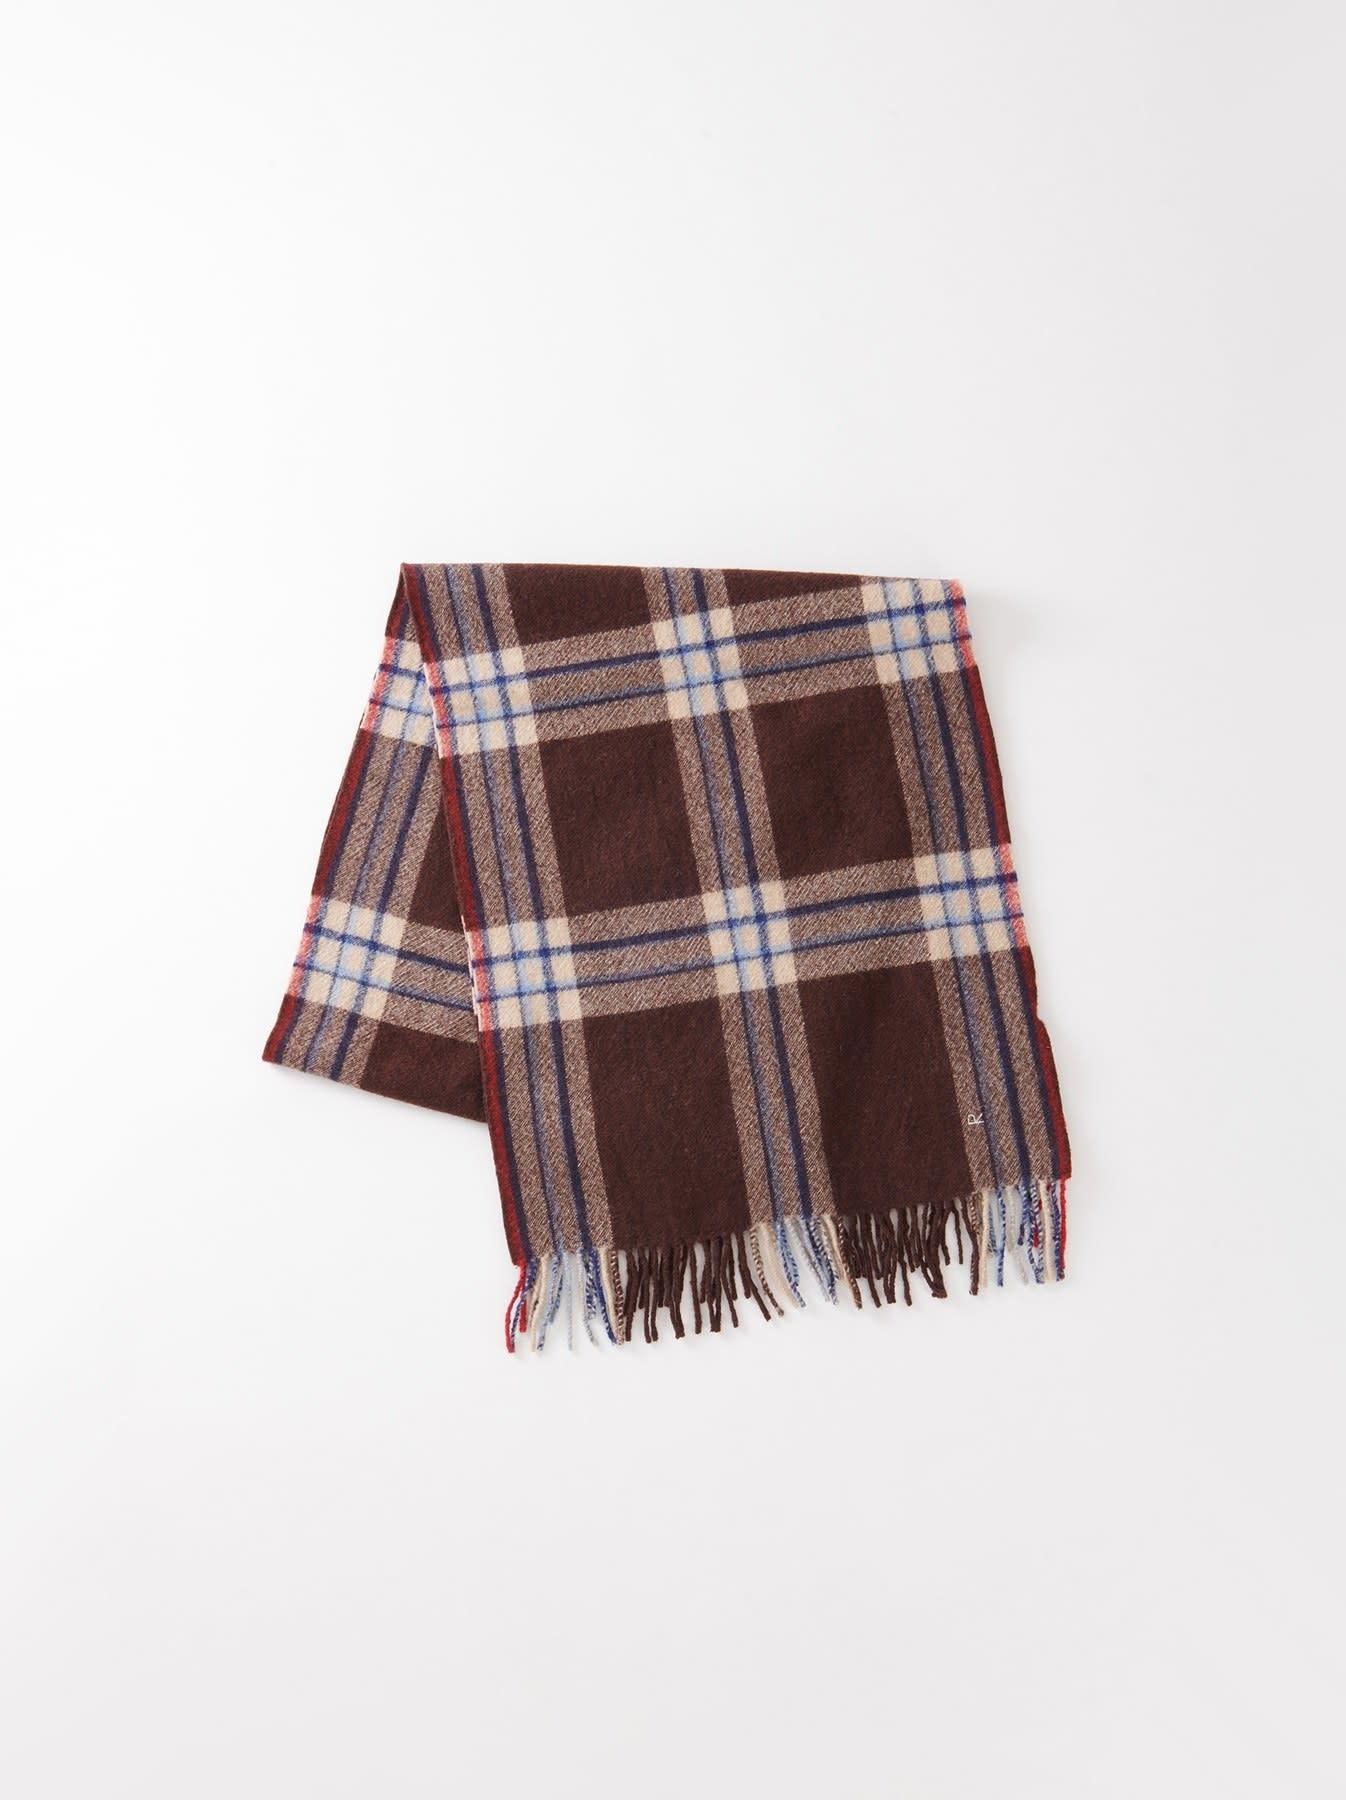 Arles Boiled Wool Muffler-2